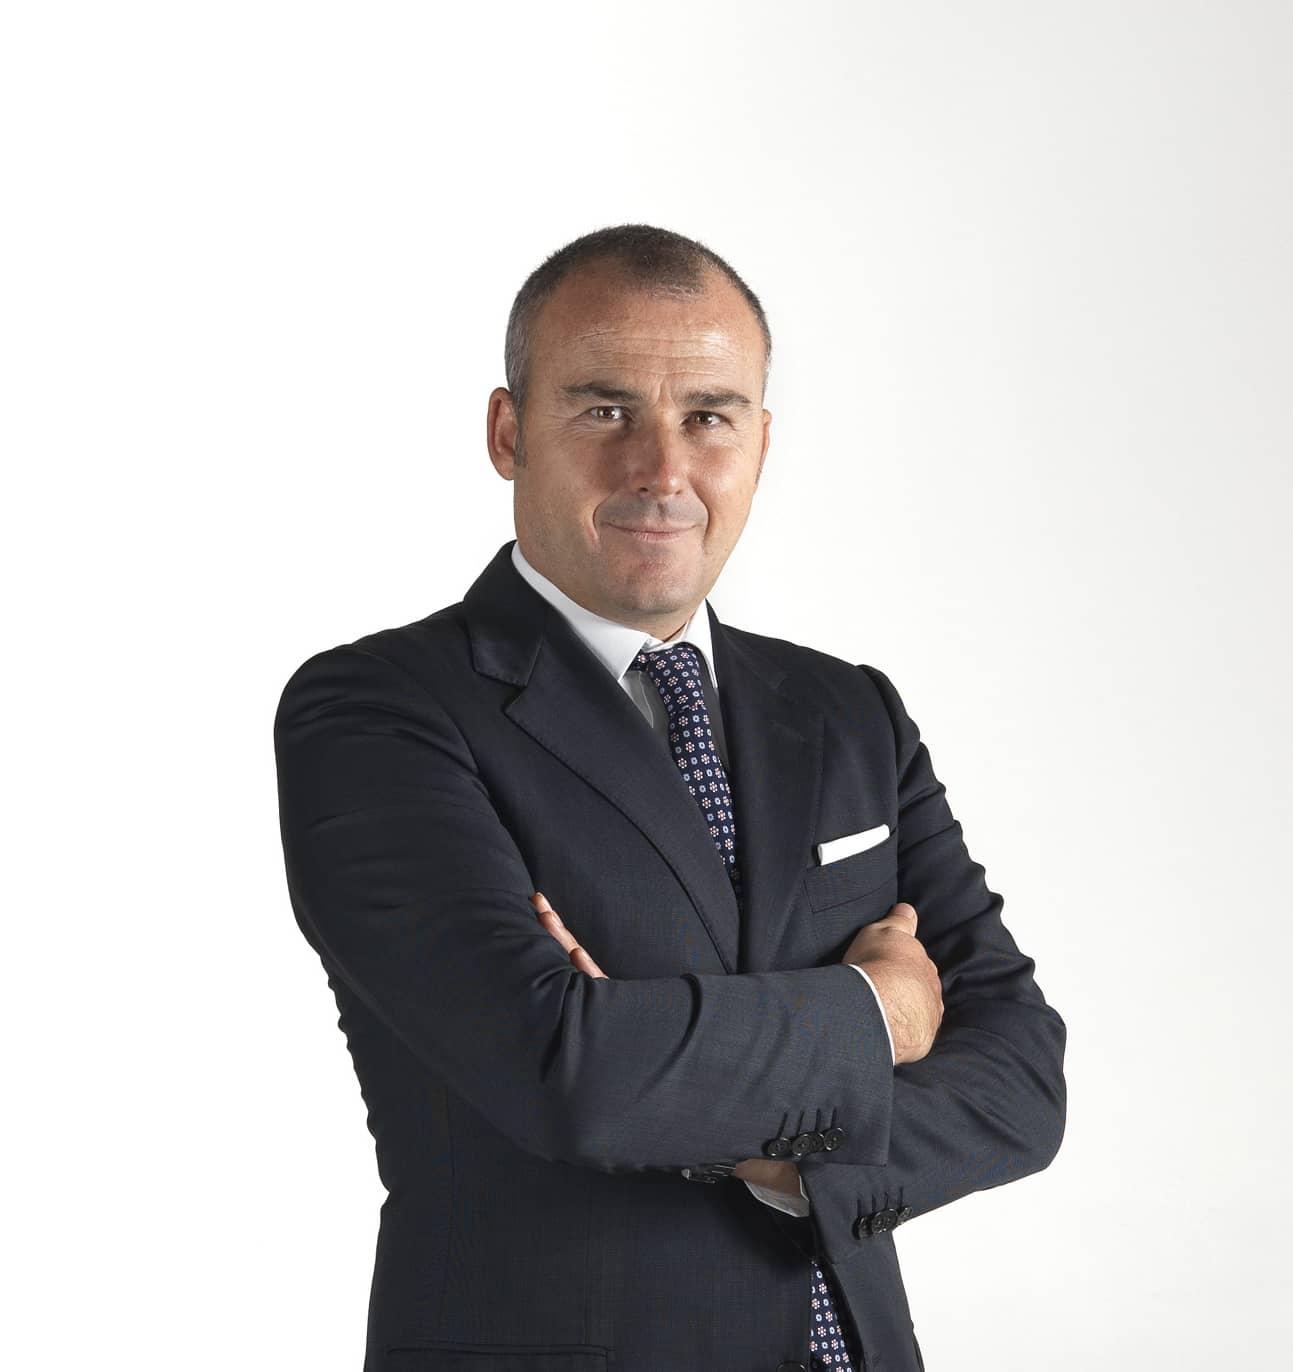 Paolo-Pastorino-assobagno